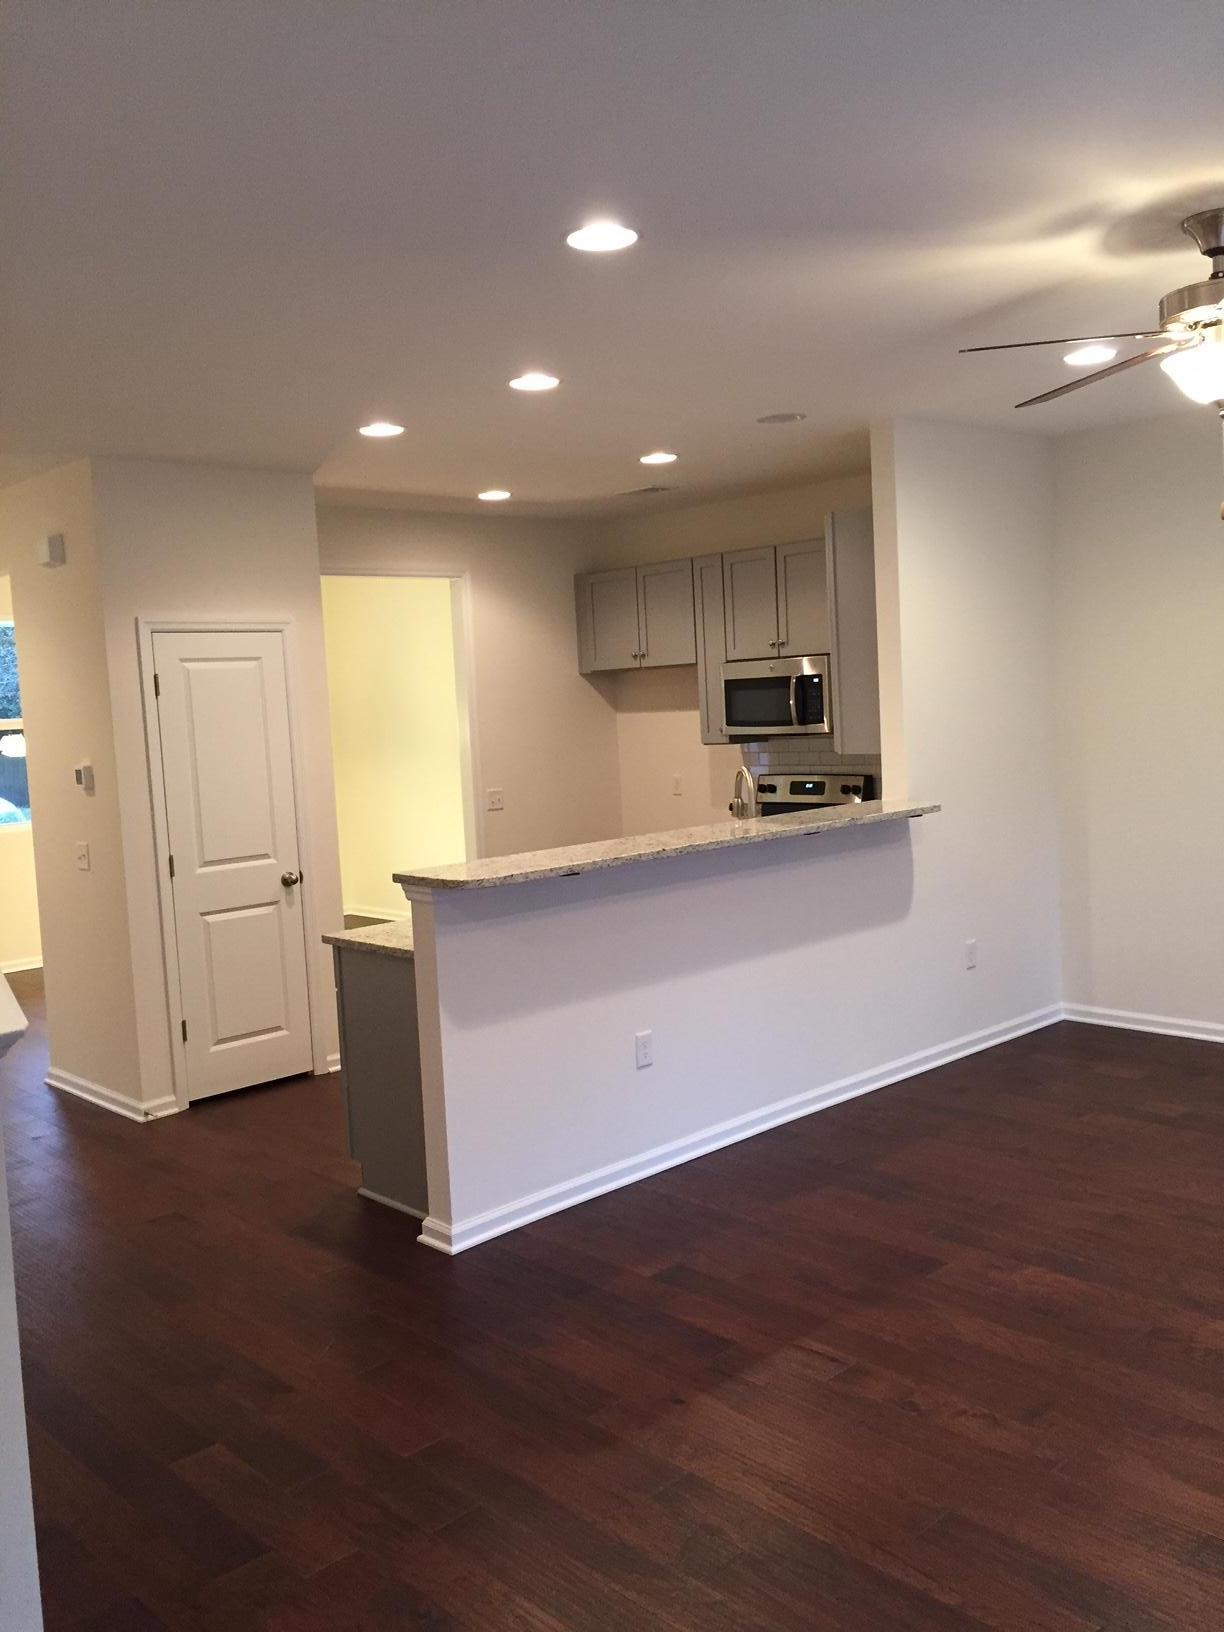 Riverland Place Homes For Sale - 274 Stefan, Charleston, SC - 30